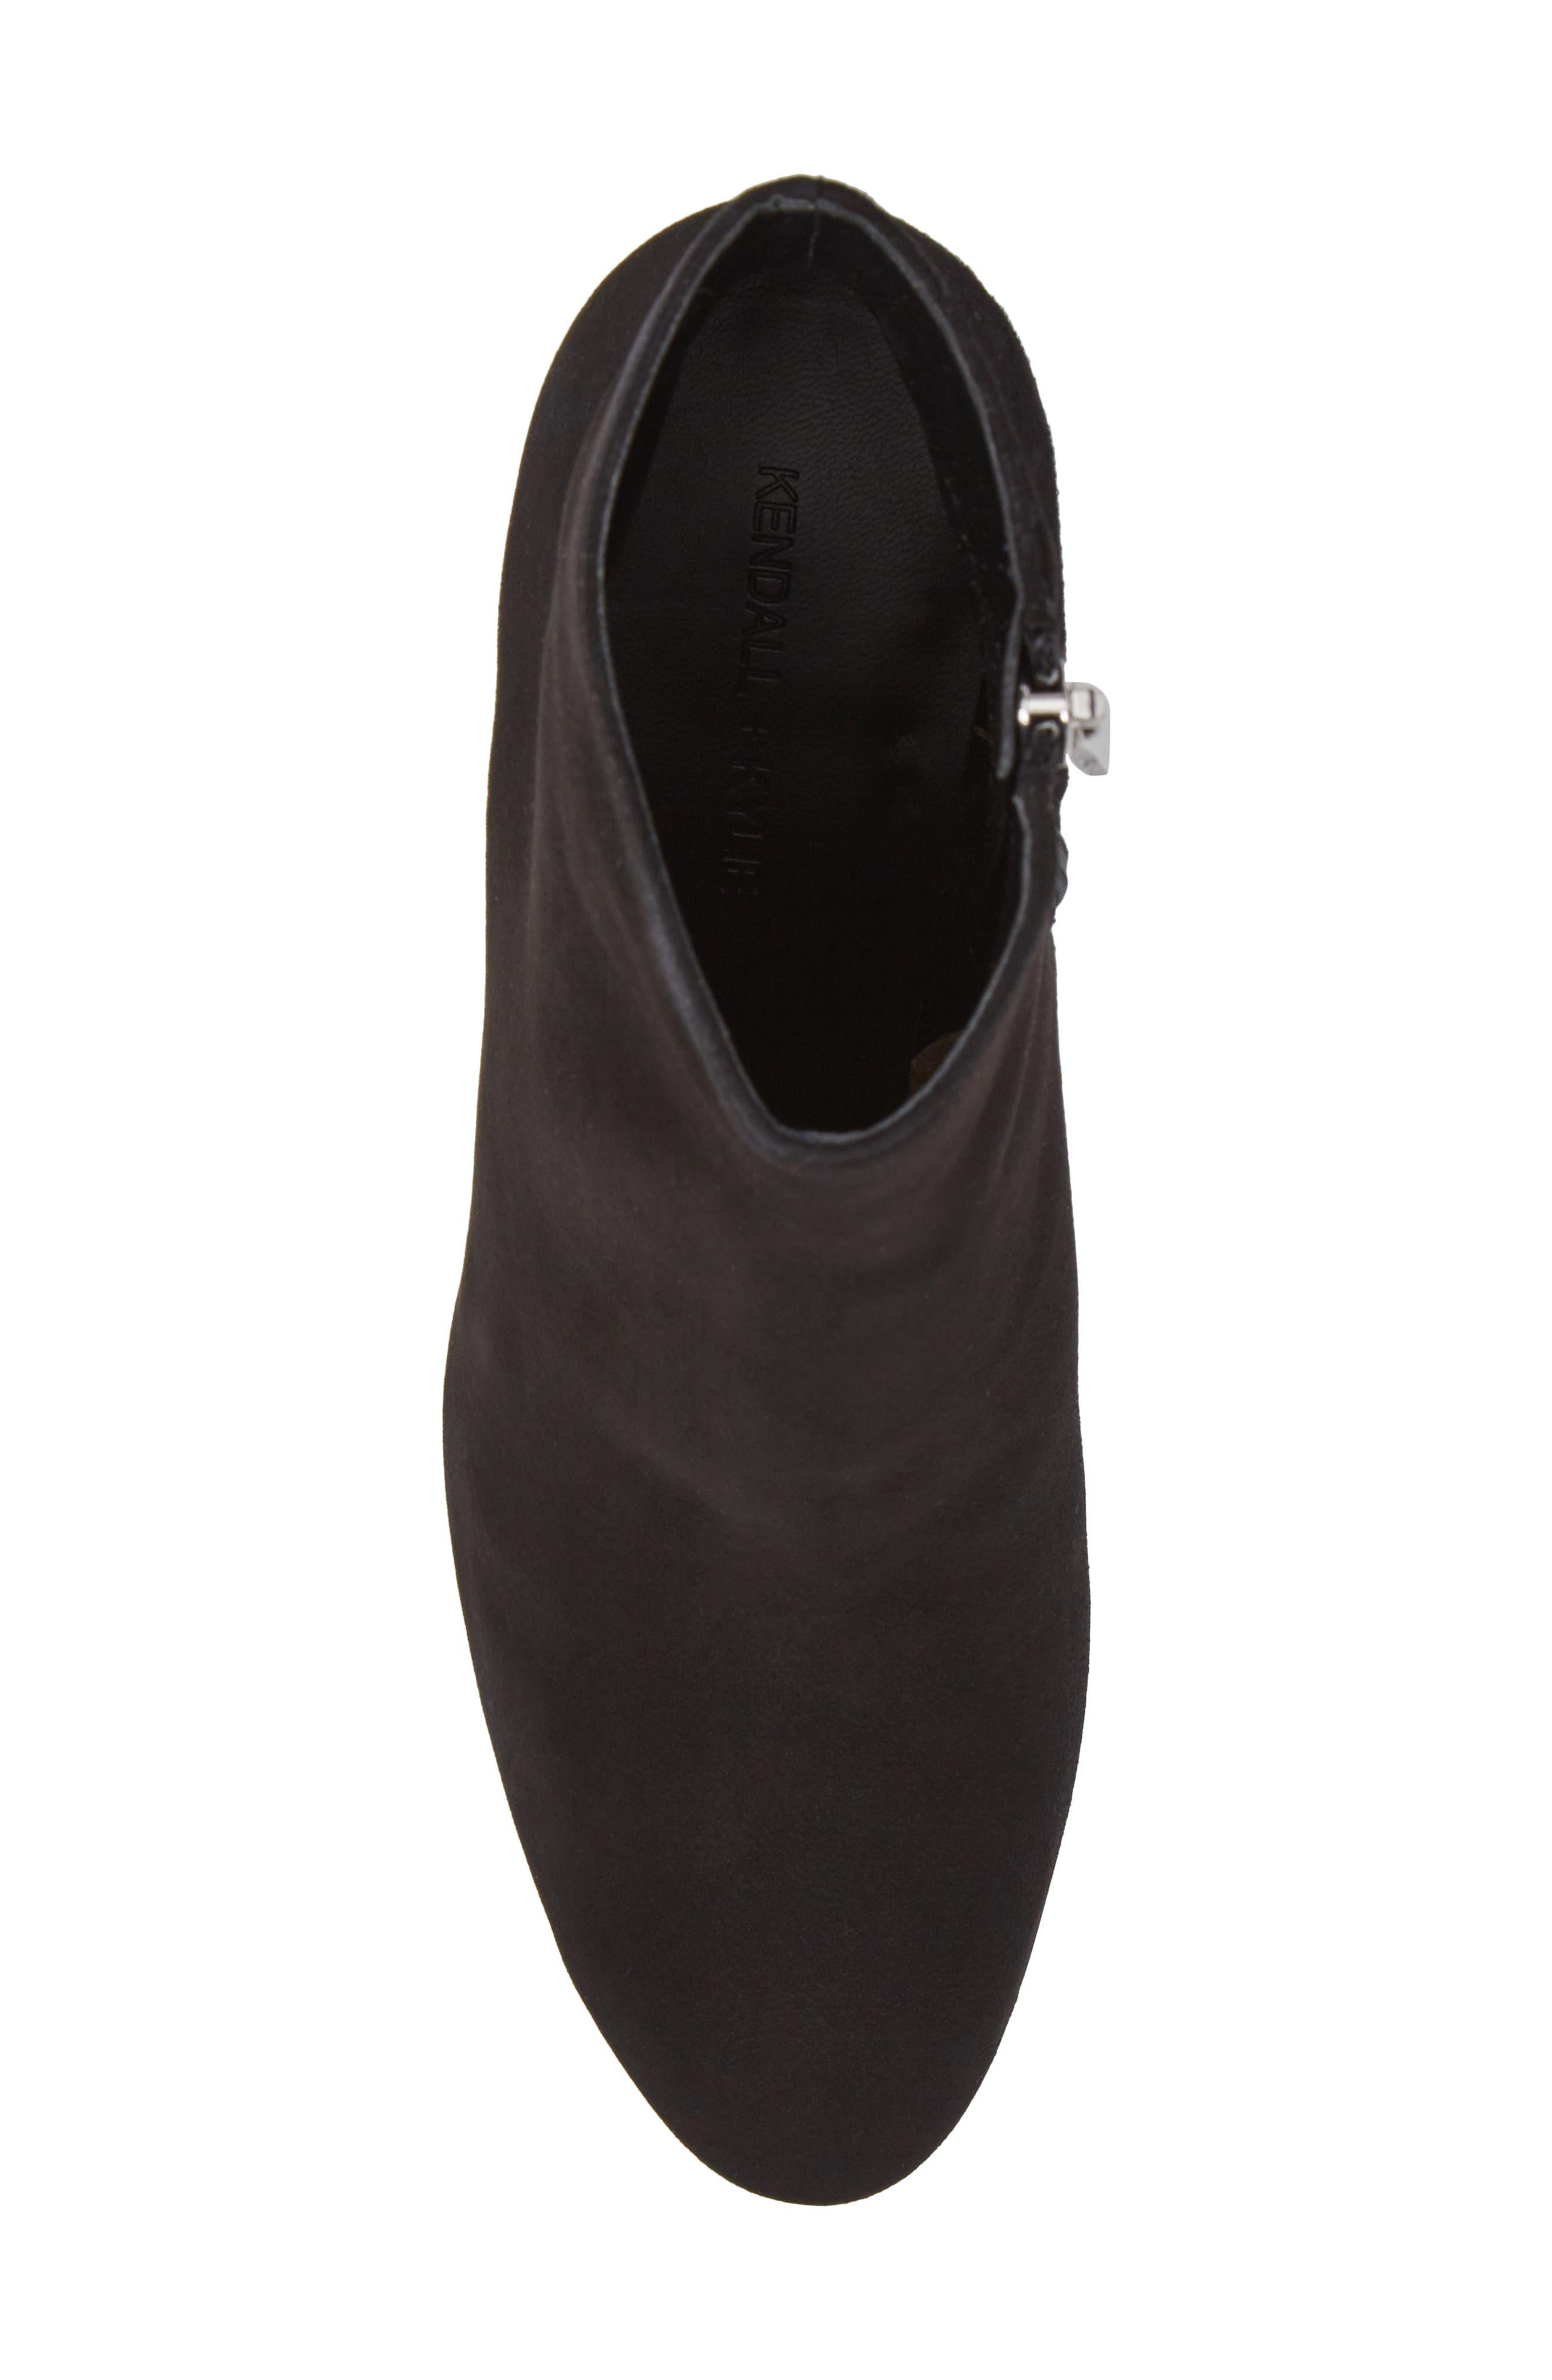 Blythe Studded Heel Bootie,                             Alternate thumbnail 5, color,                             Black Suede